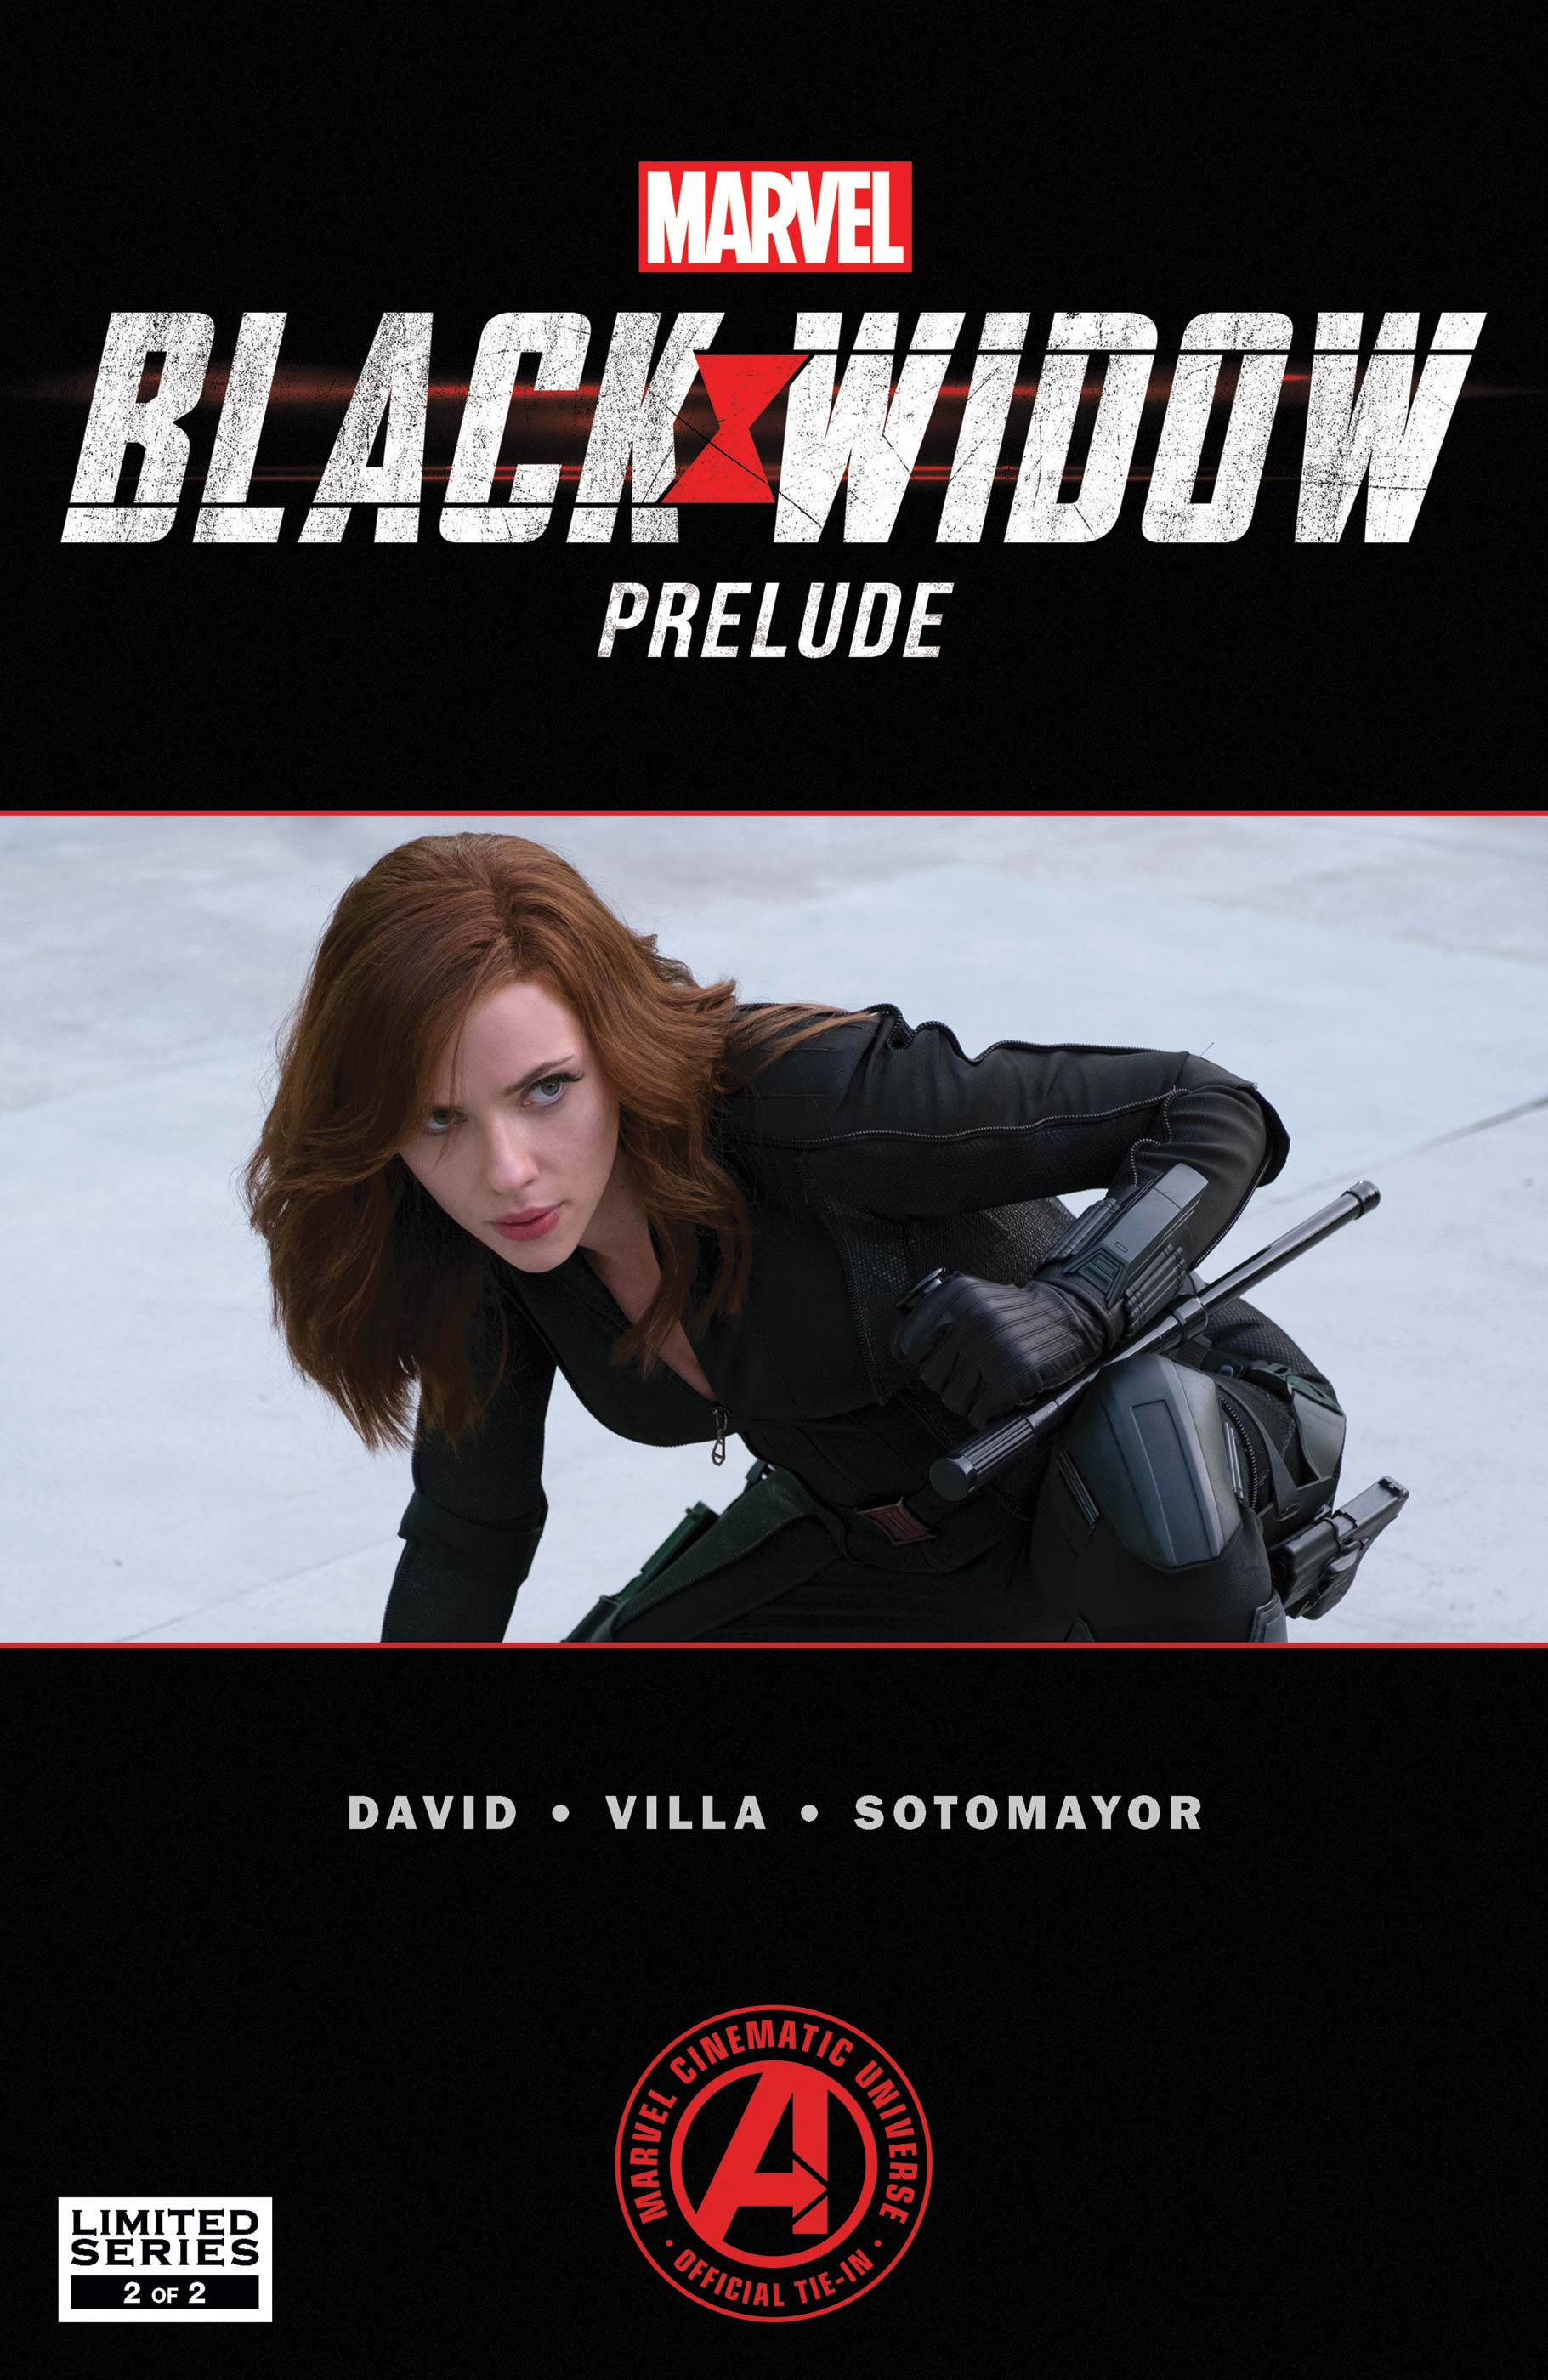 Marvel's Black Widow Prelude (2020) #2